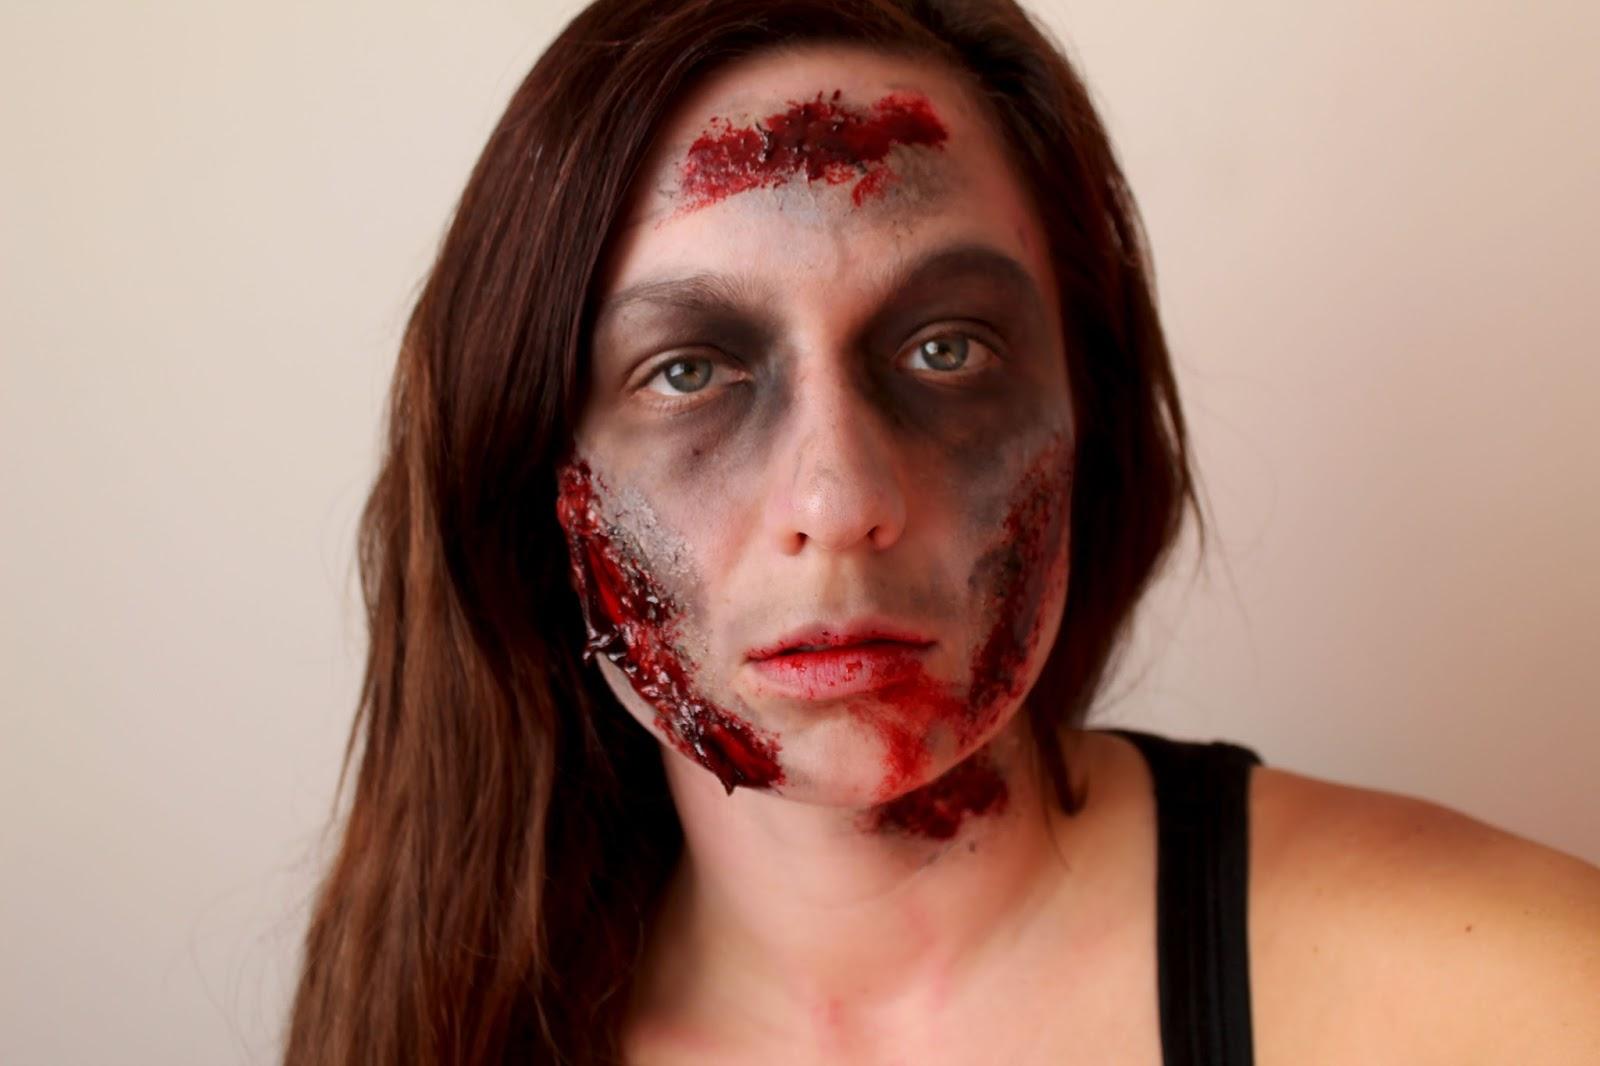 halloween series kickoff! walking dead is back! zombie makeup